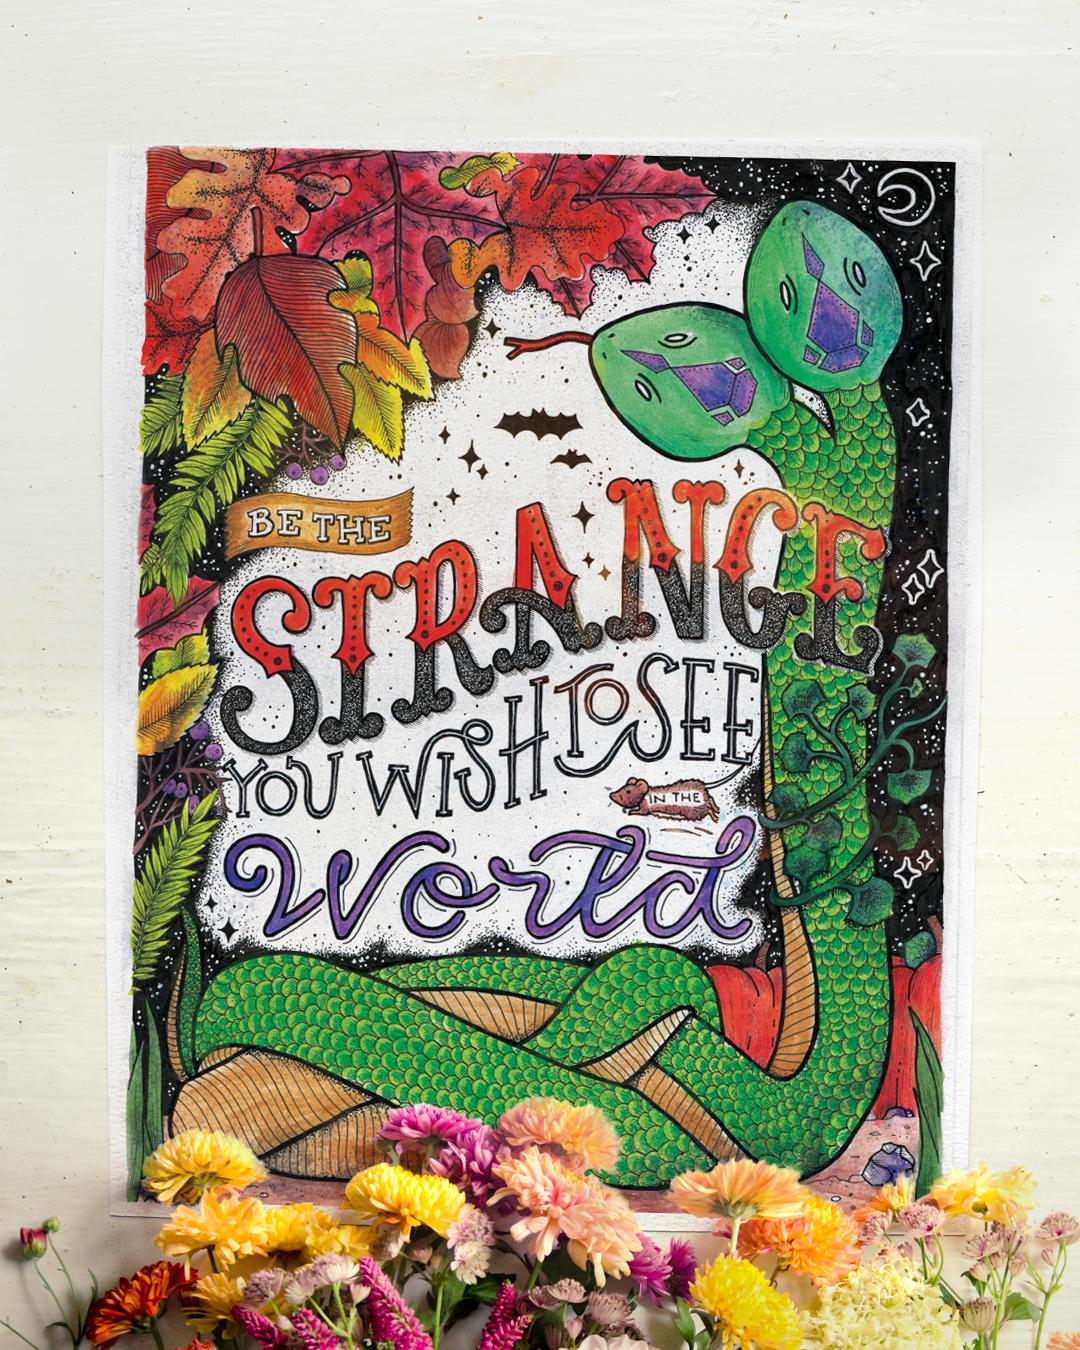 Be the Strange_flat lay.jpg